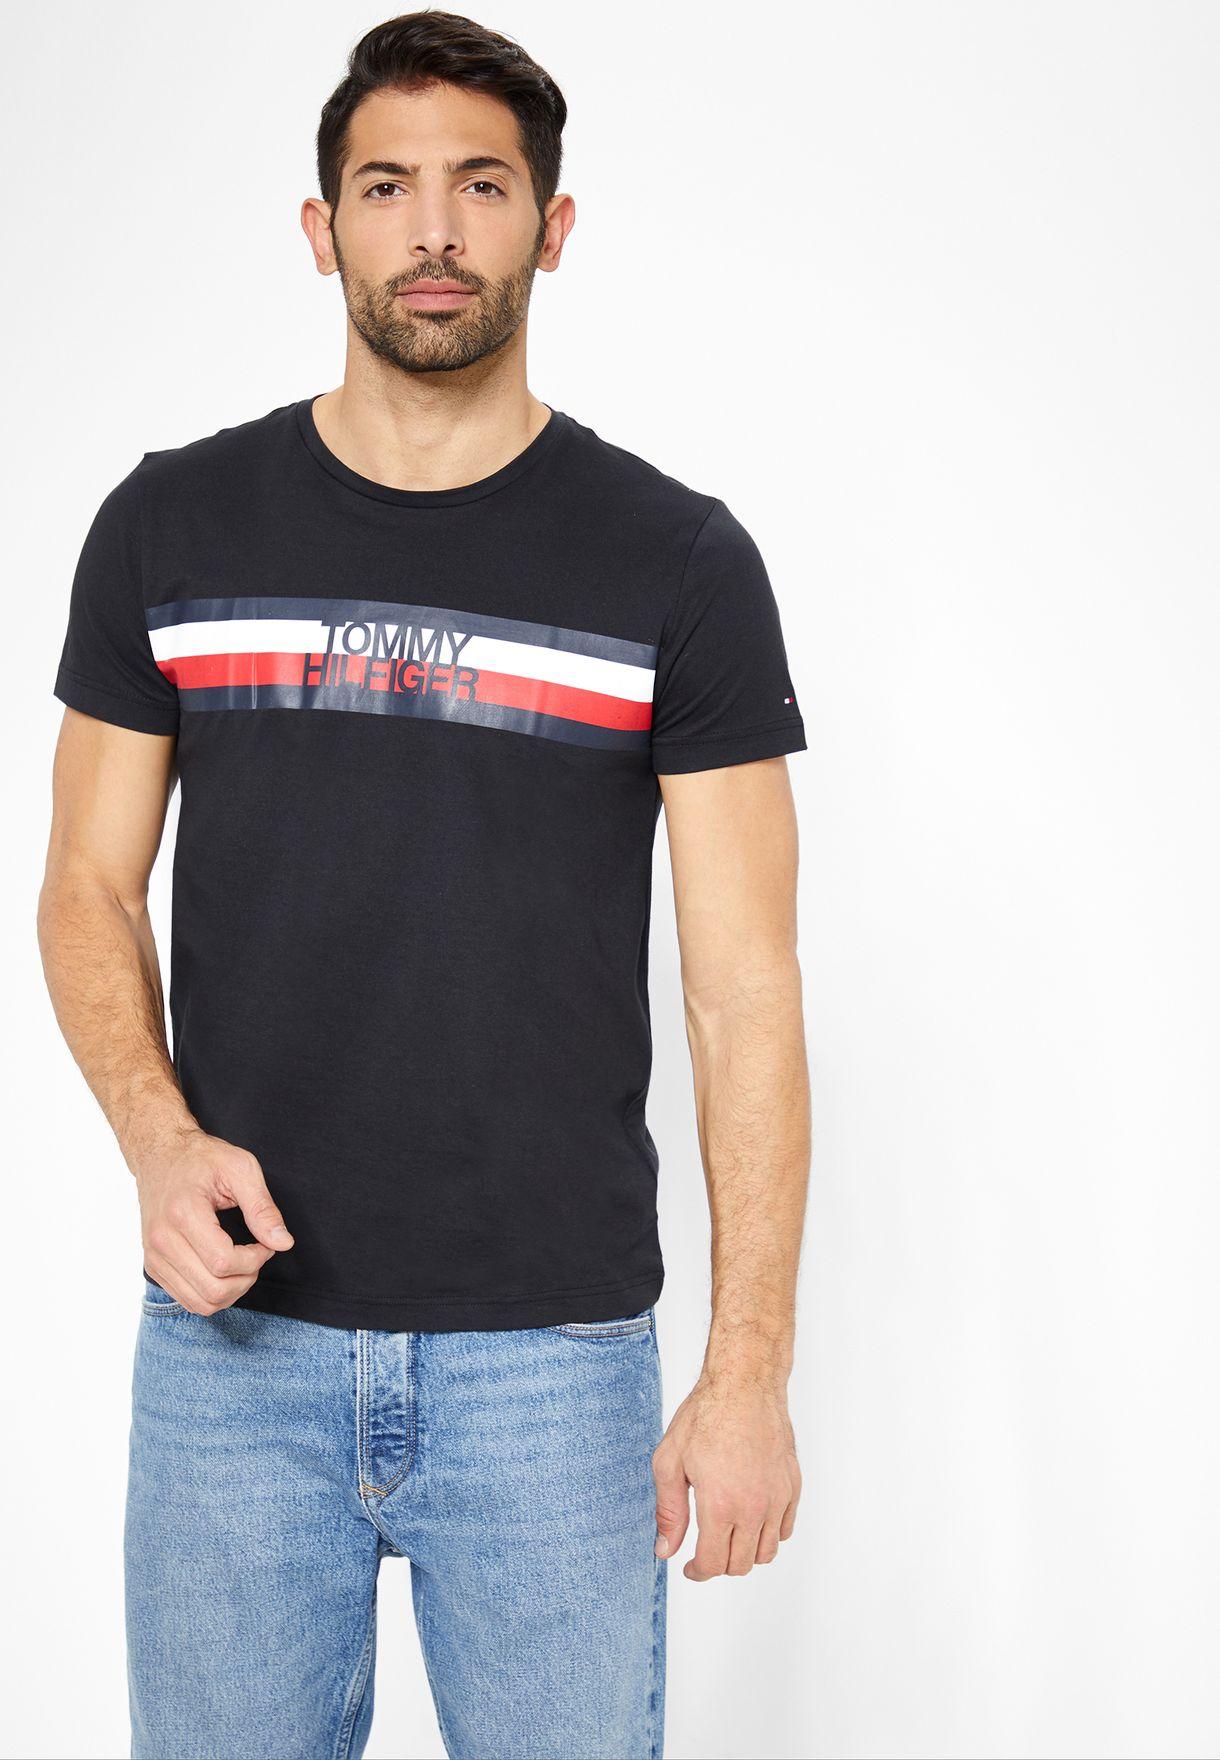 9c7041755 Shop Tommy Hilfiger black Crew Neck Logo Crew Neck T-Shirt ...